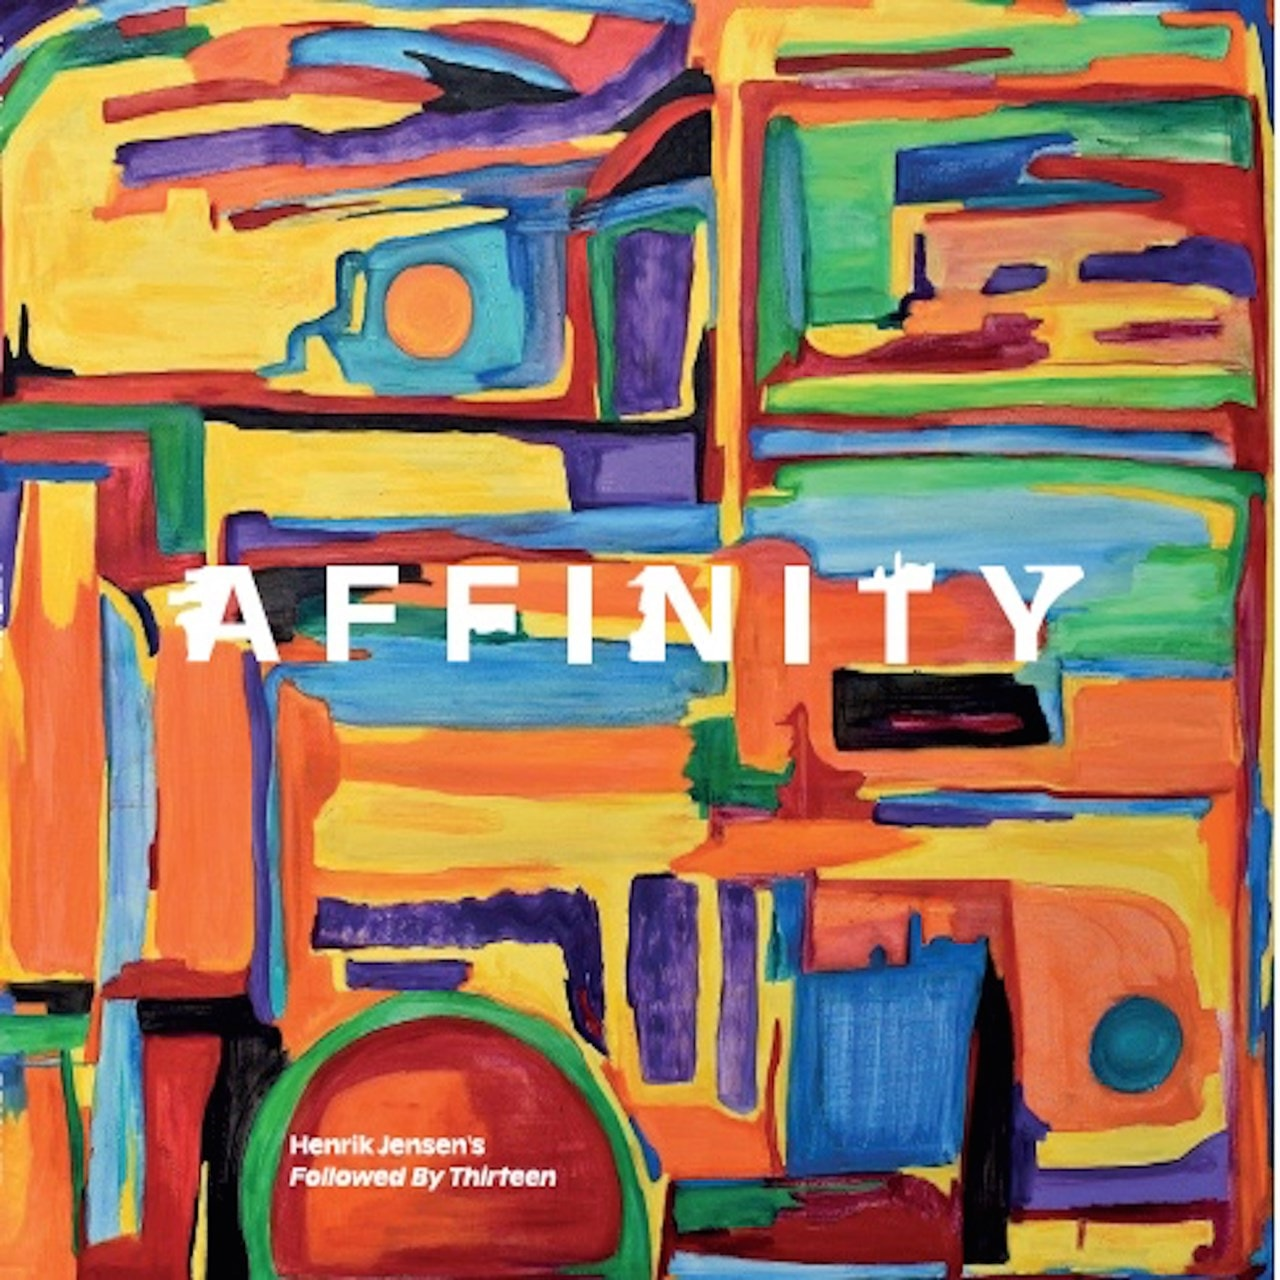 Affinity - 1